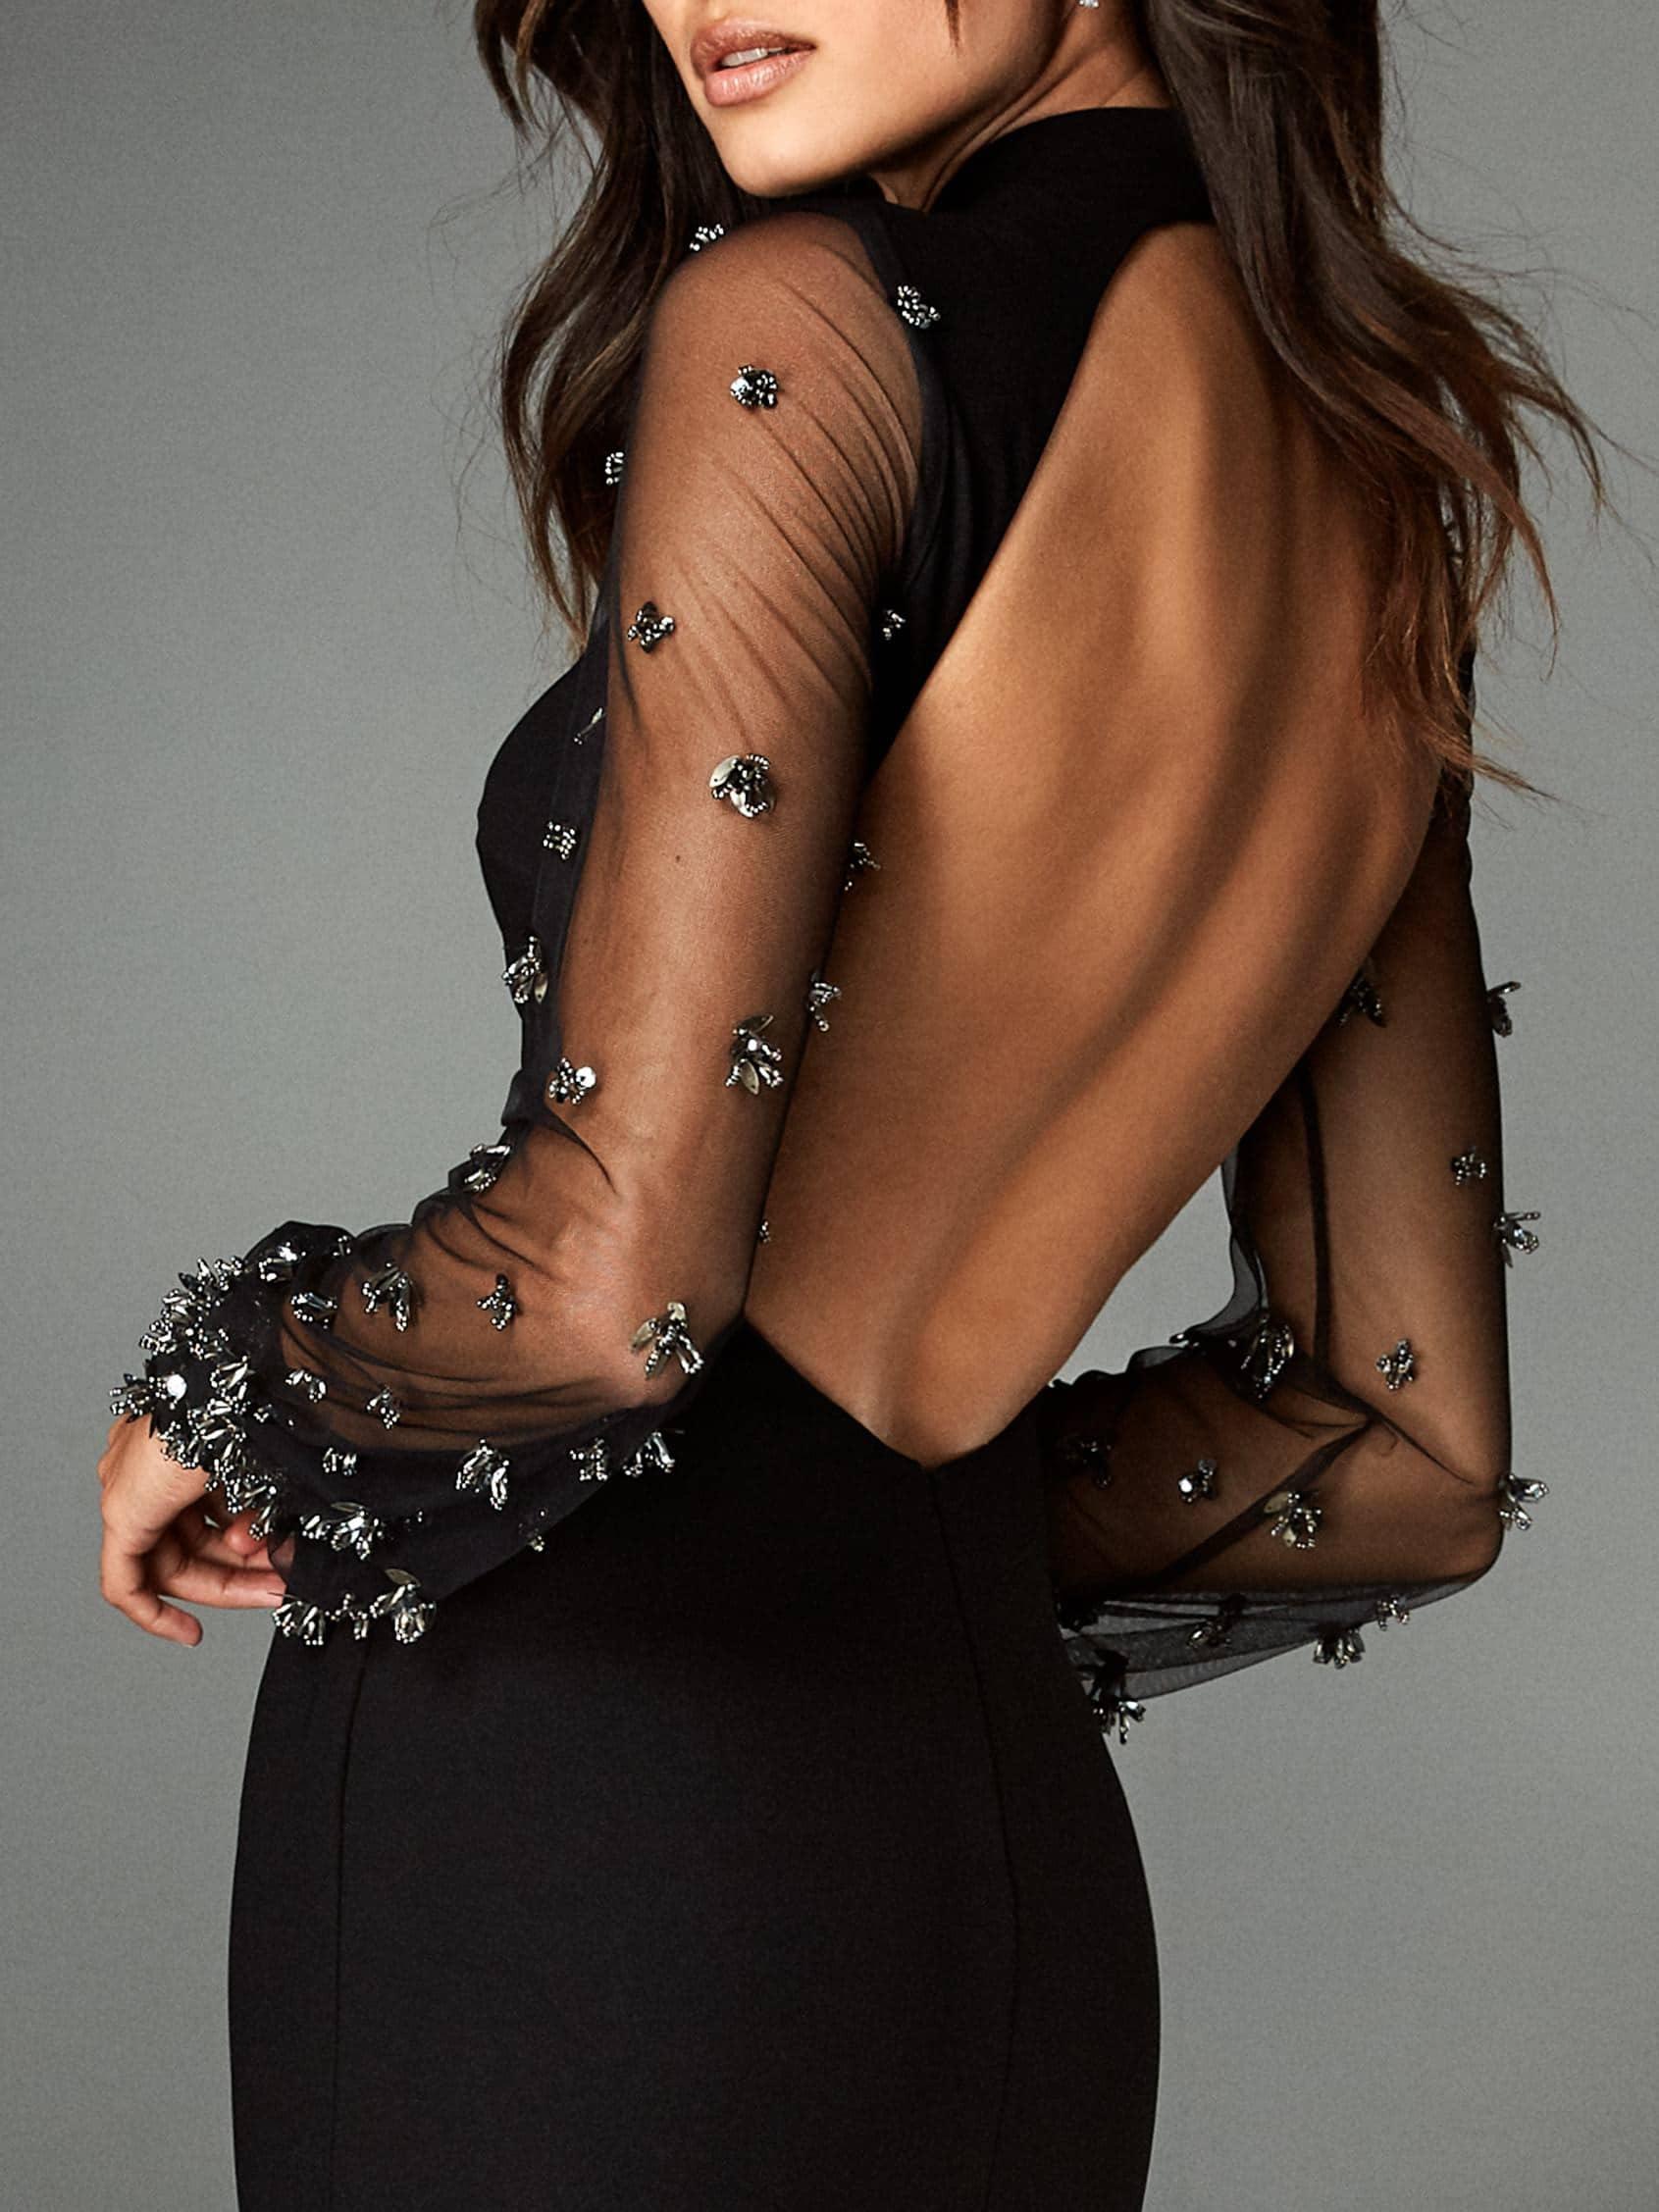 zwarte avondjurk